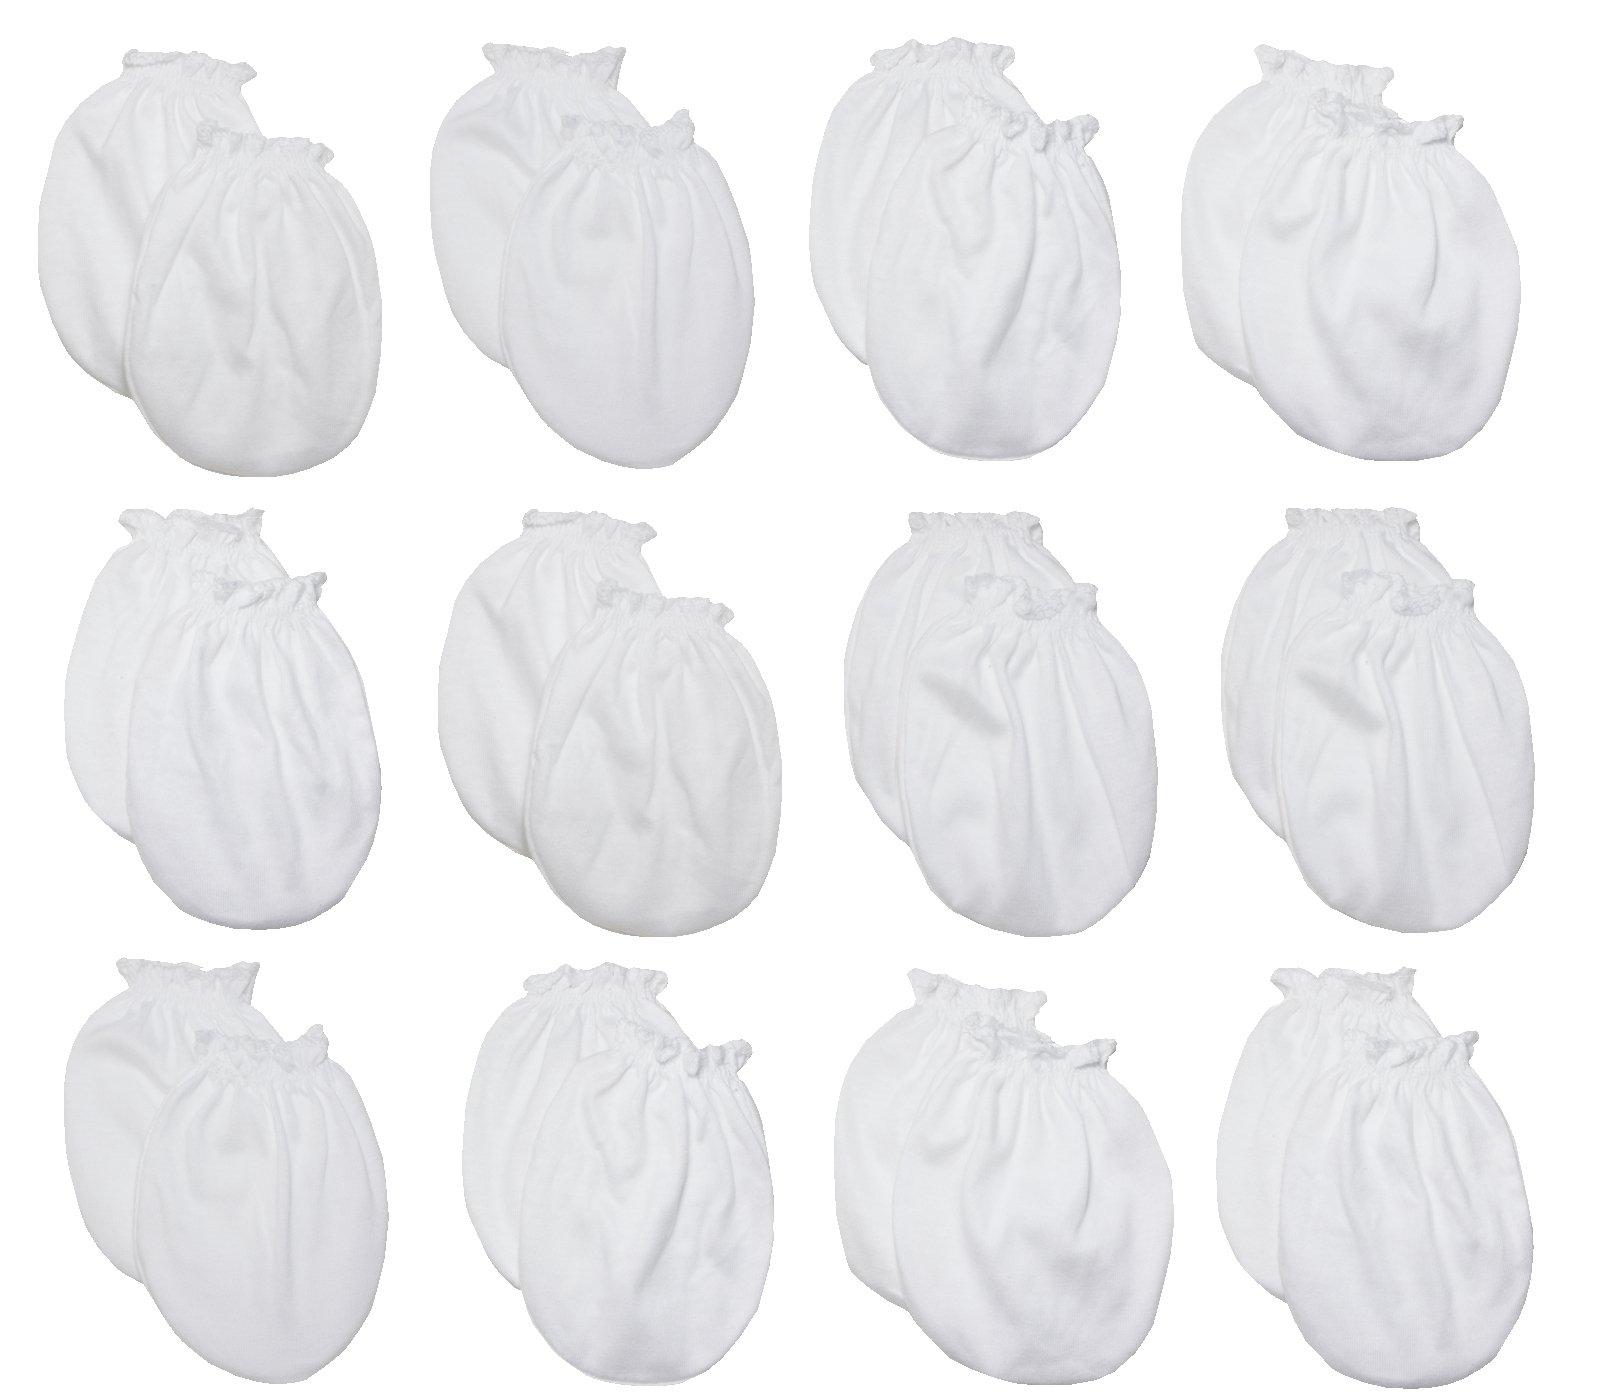 LUCKY LUCKY Baby Boys Girls Gloves,No Scratch Mittens 100%Cotton 12Pair